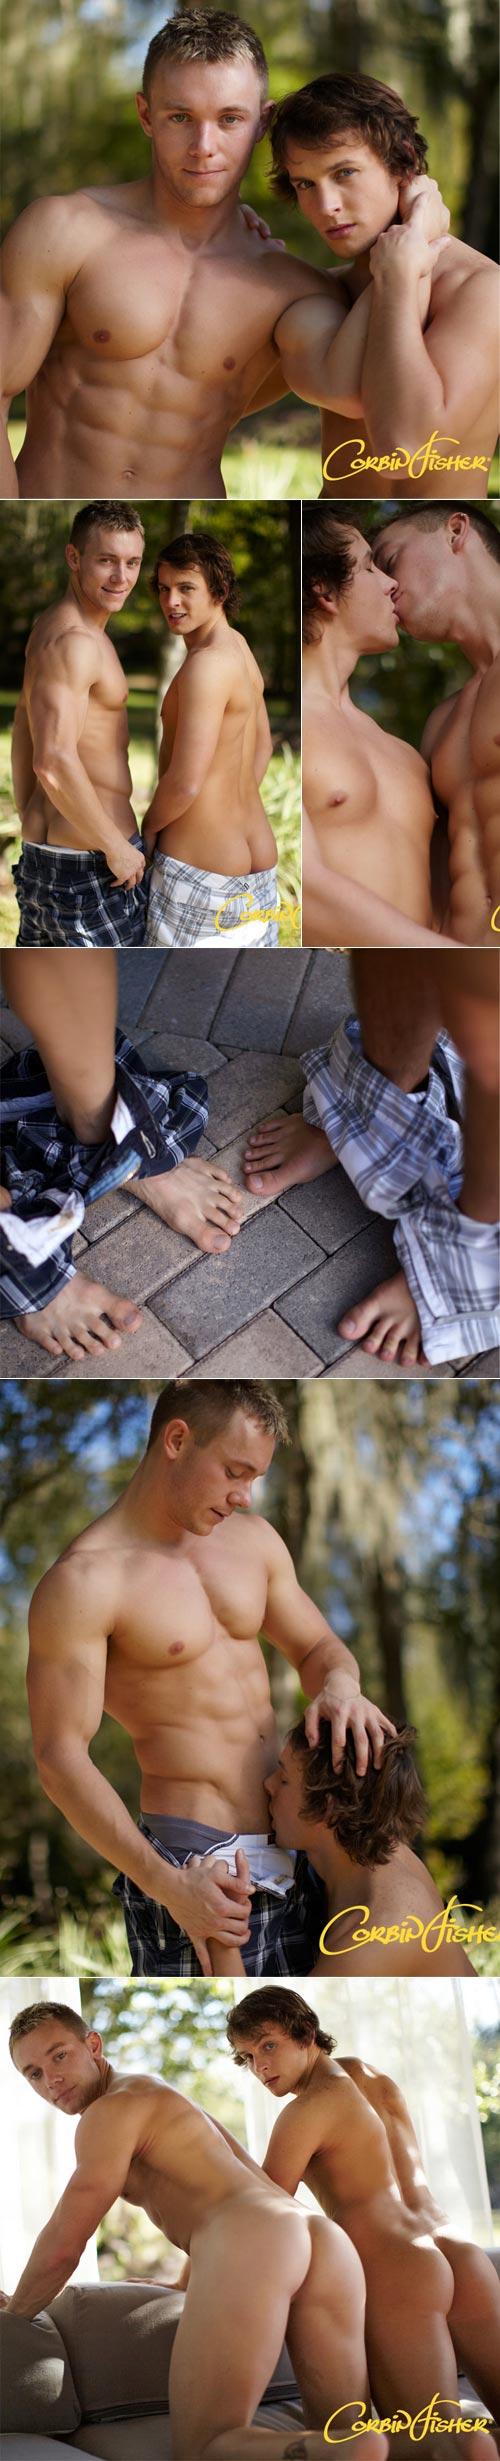 chicos cogiendo